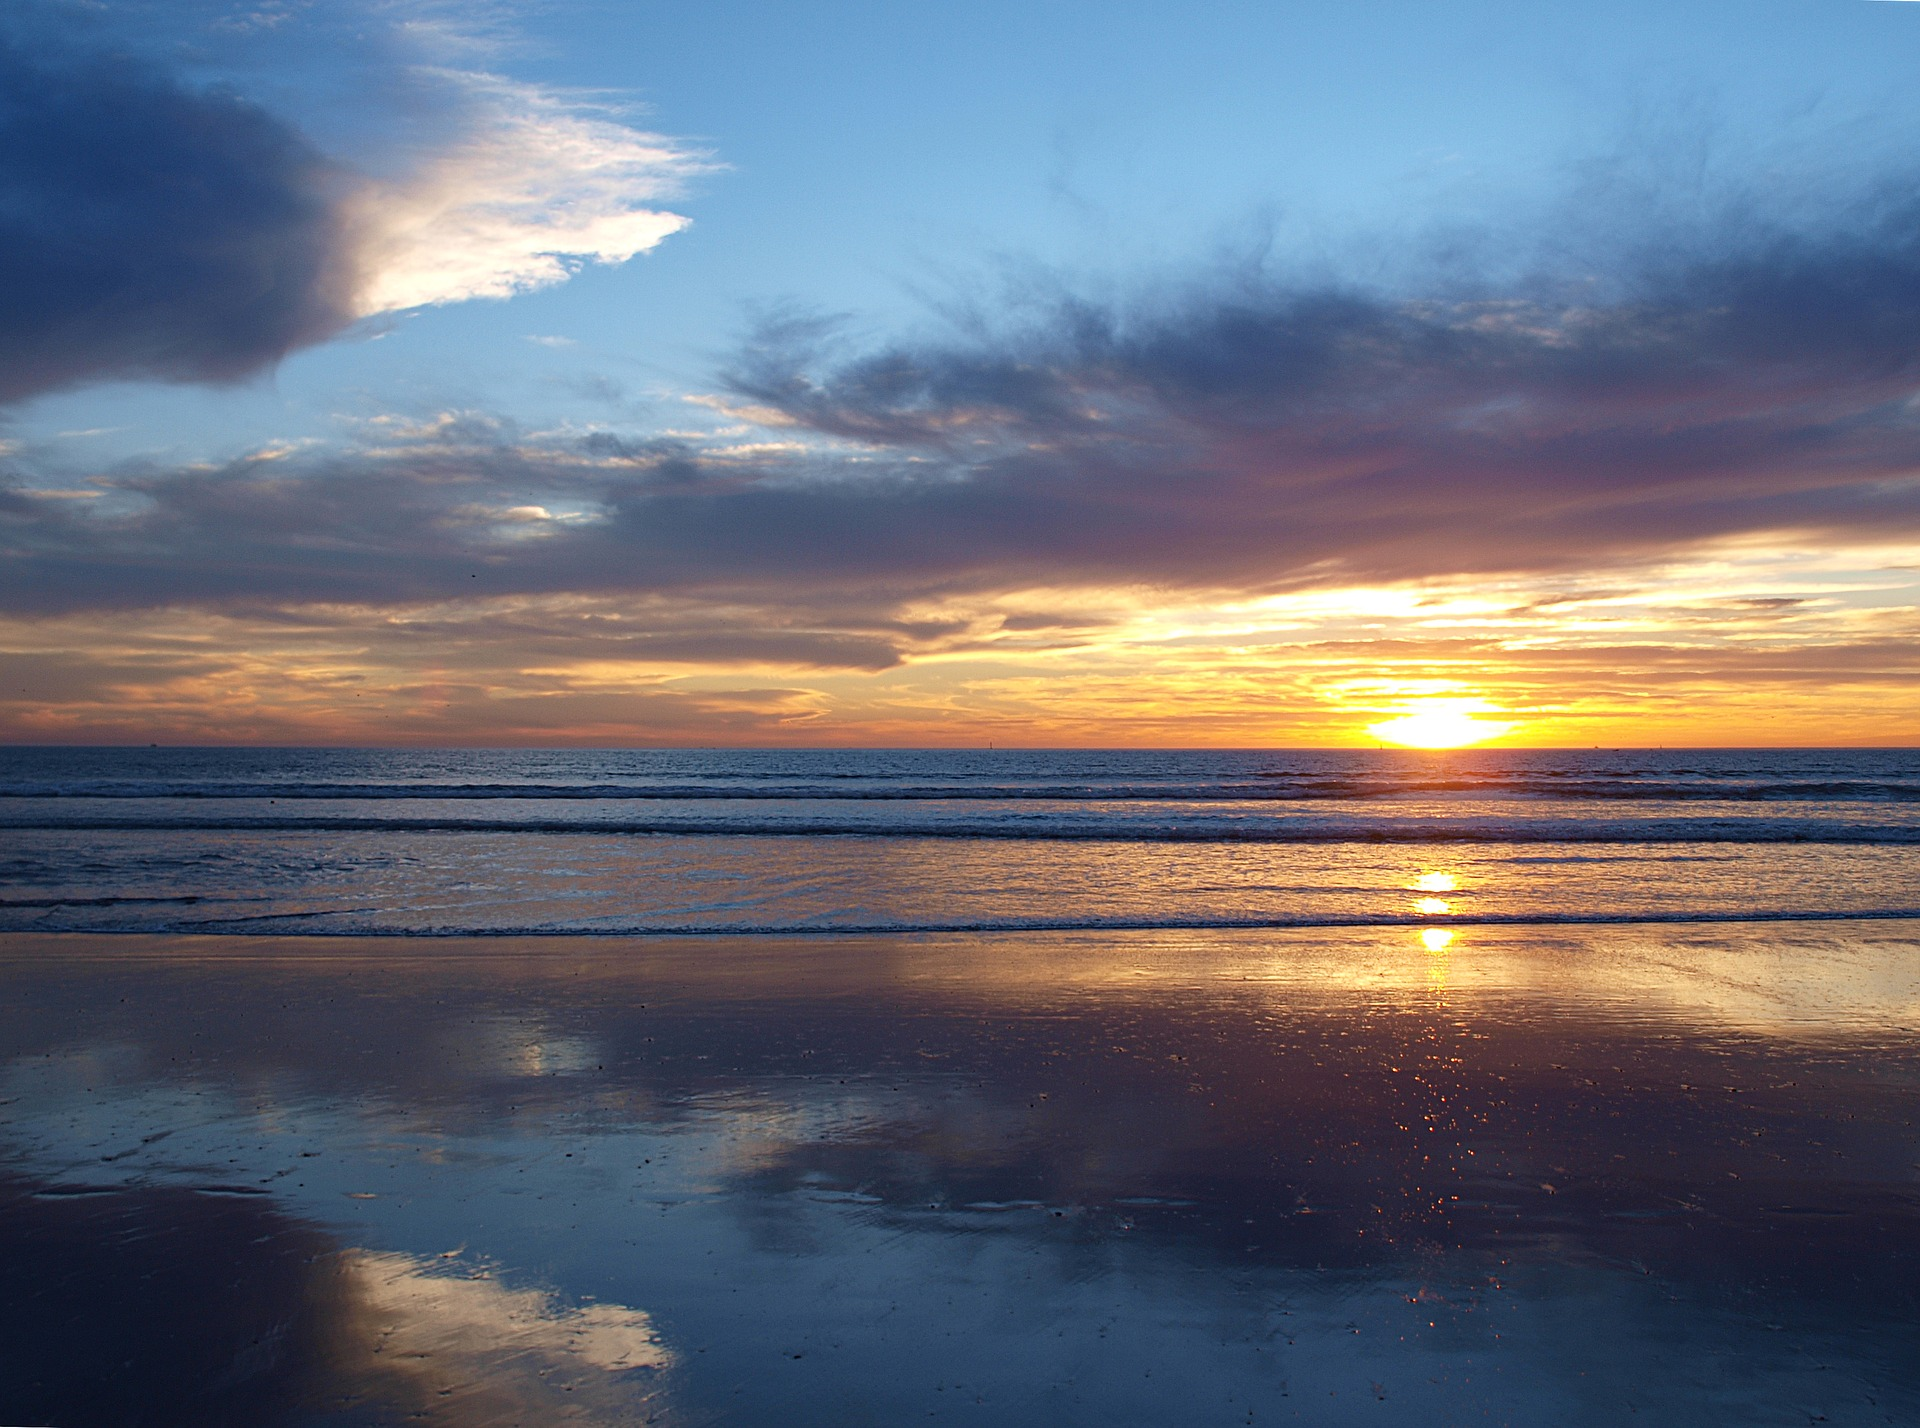 Marokko Agadir - Strand und Meer bei Sonnenuntergang